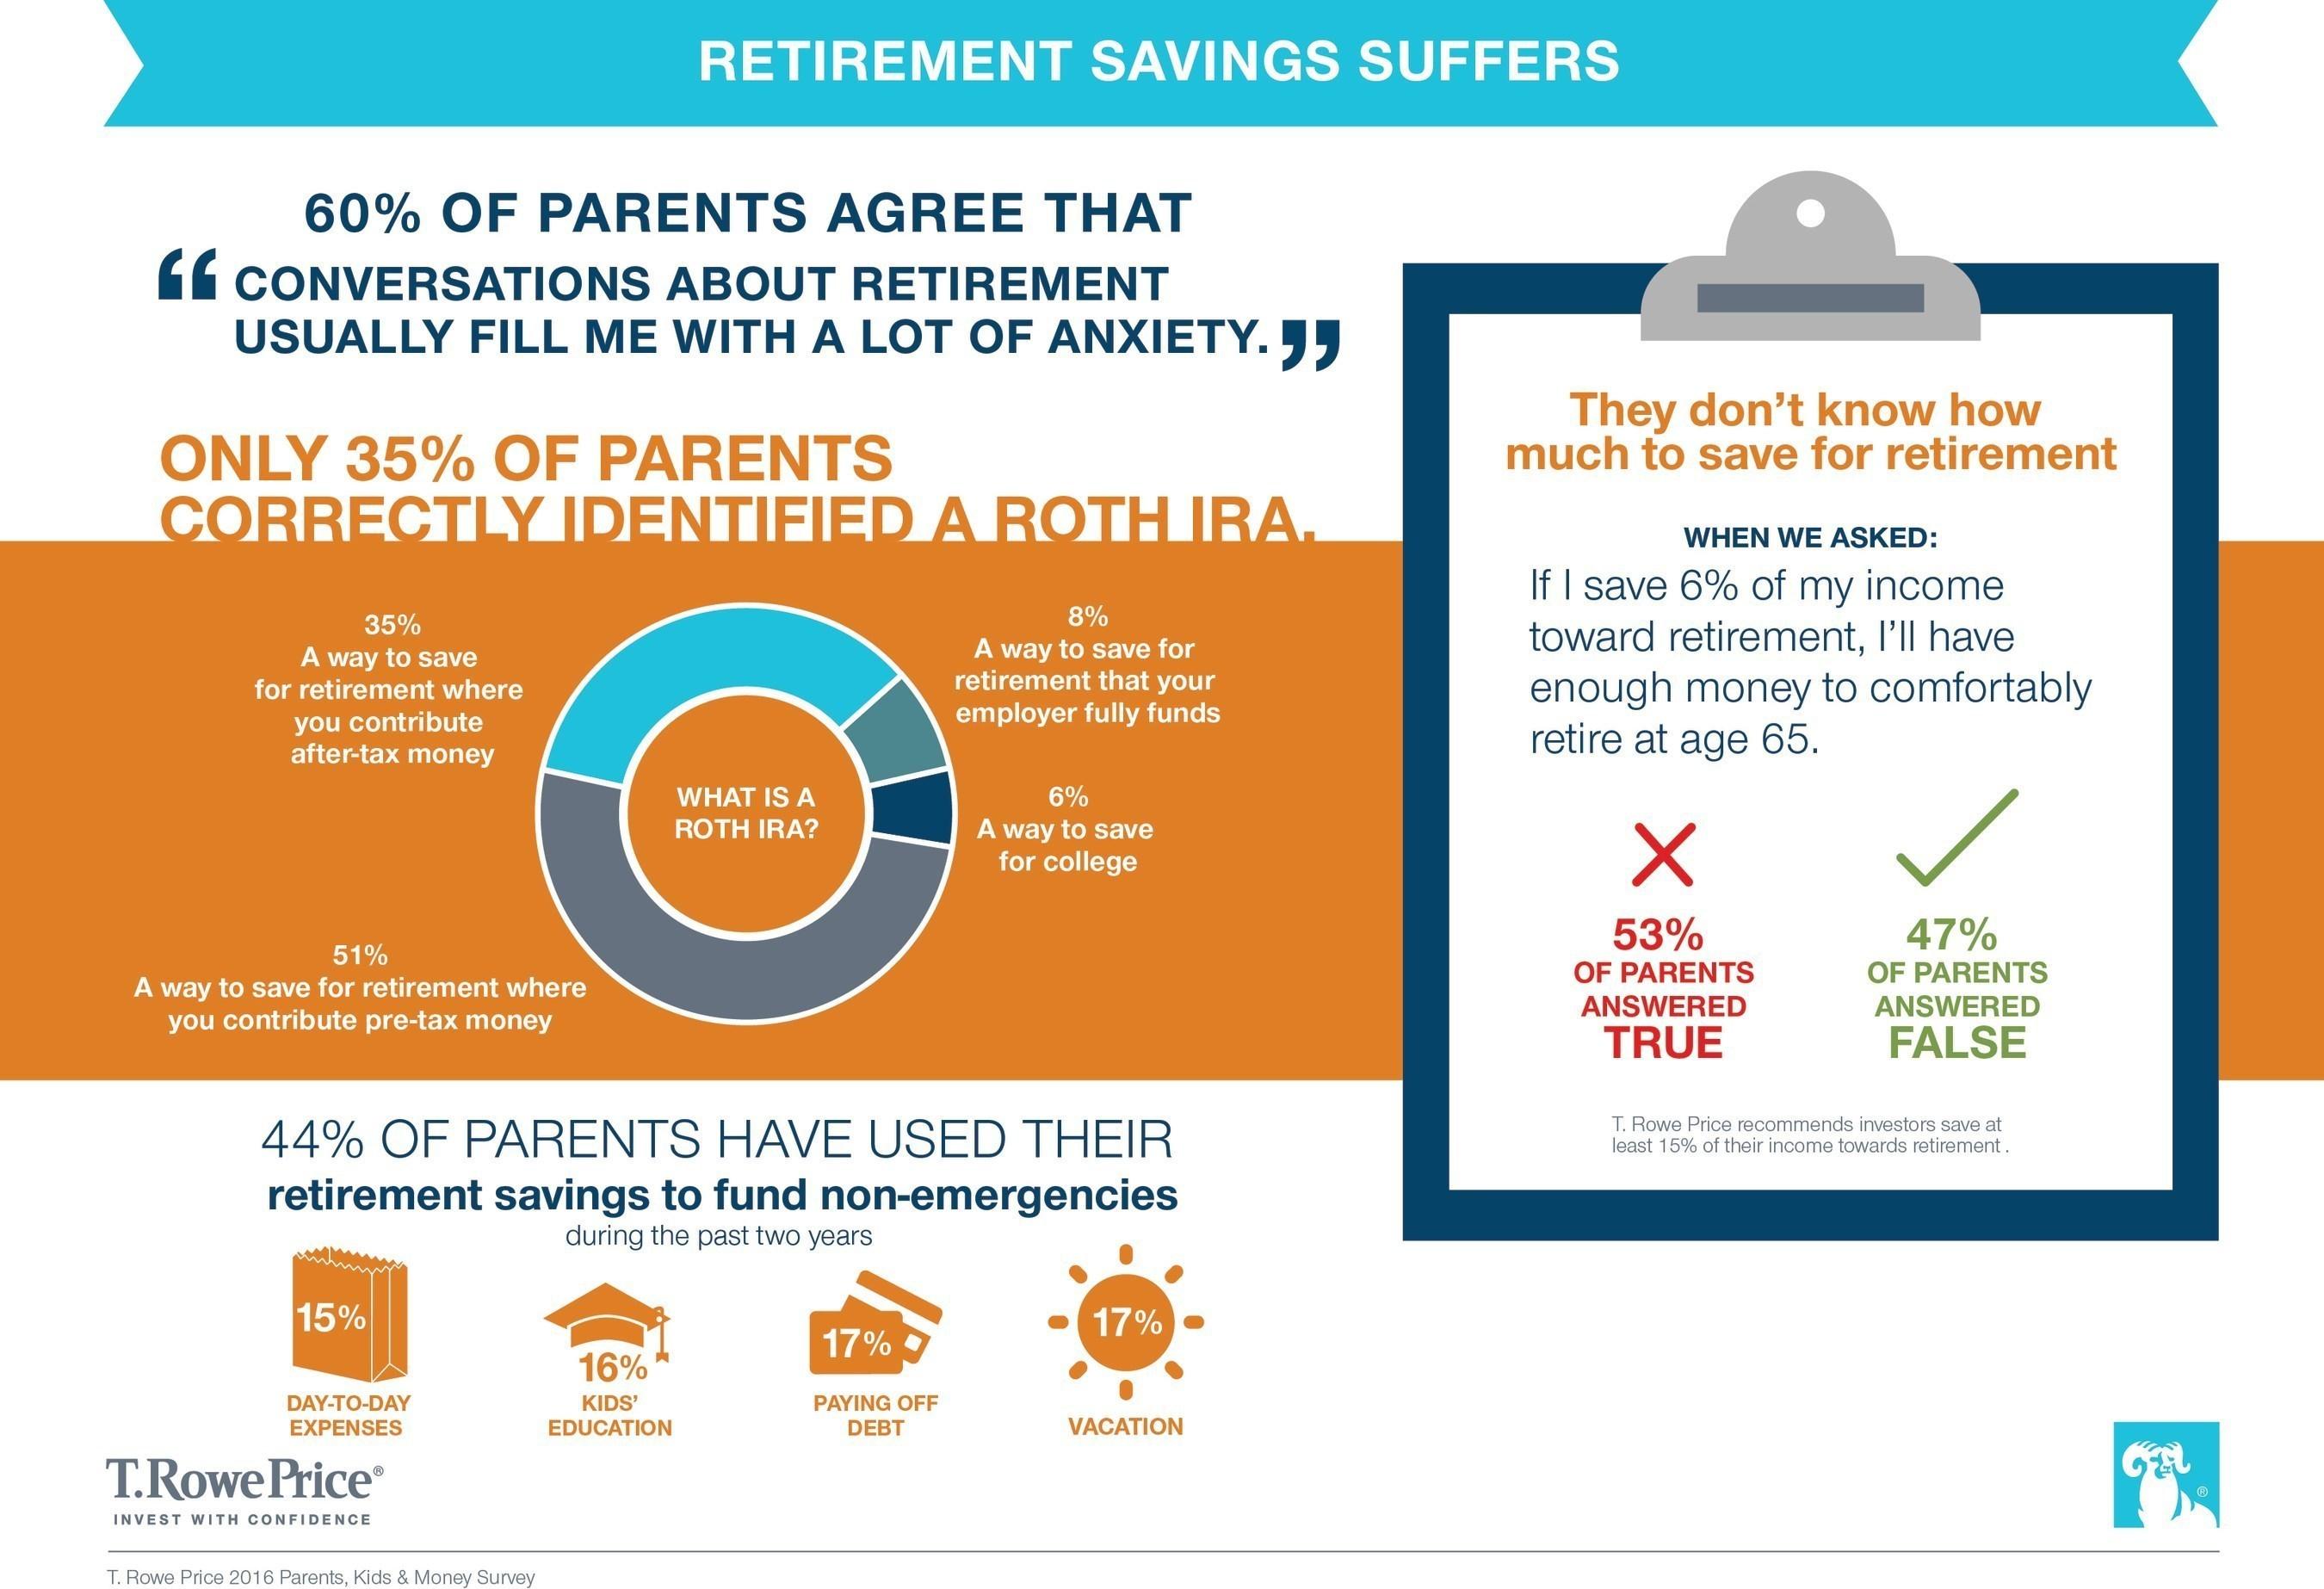 Retirement Savings Suffers